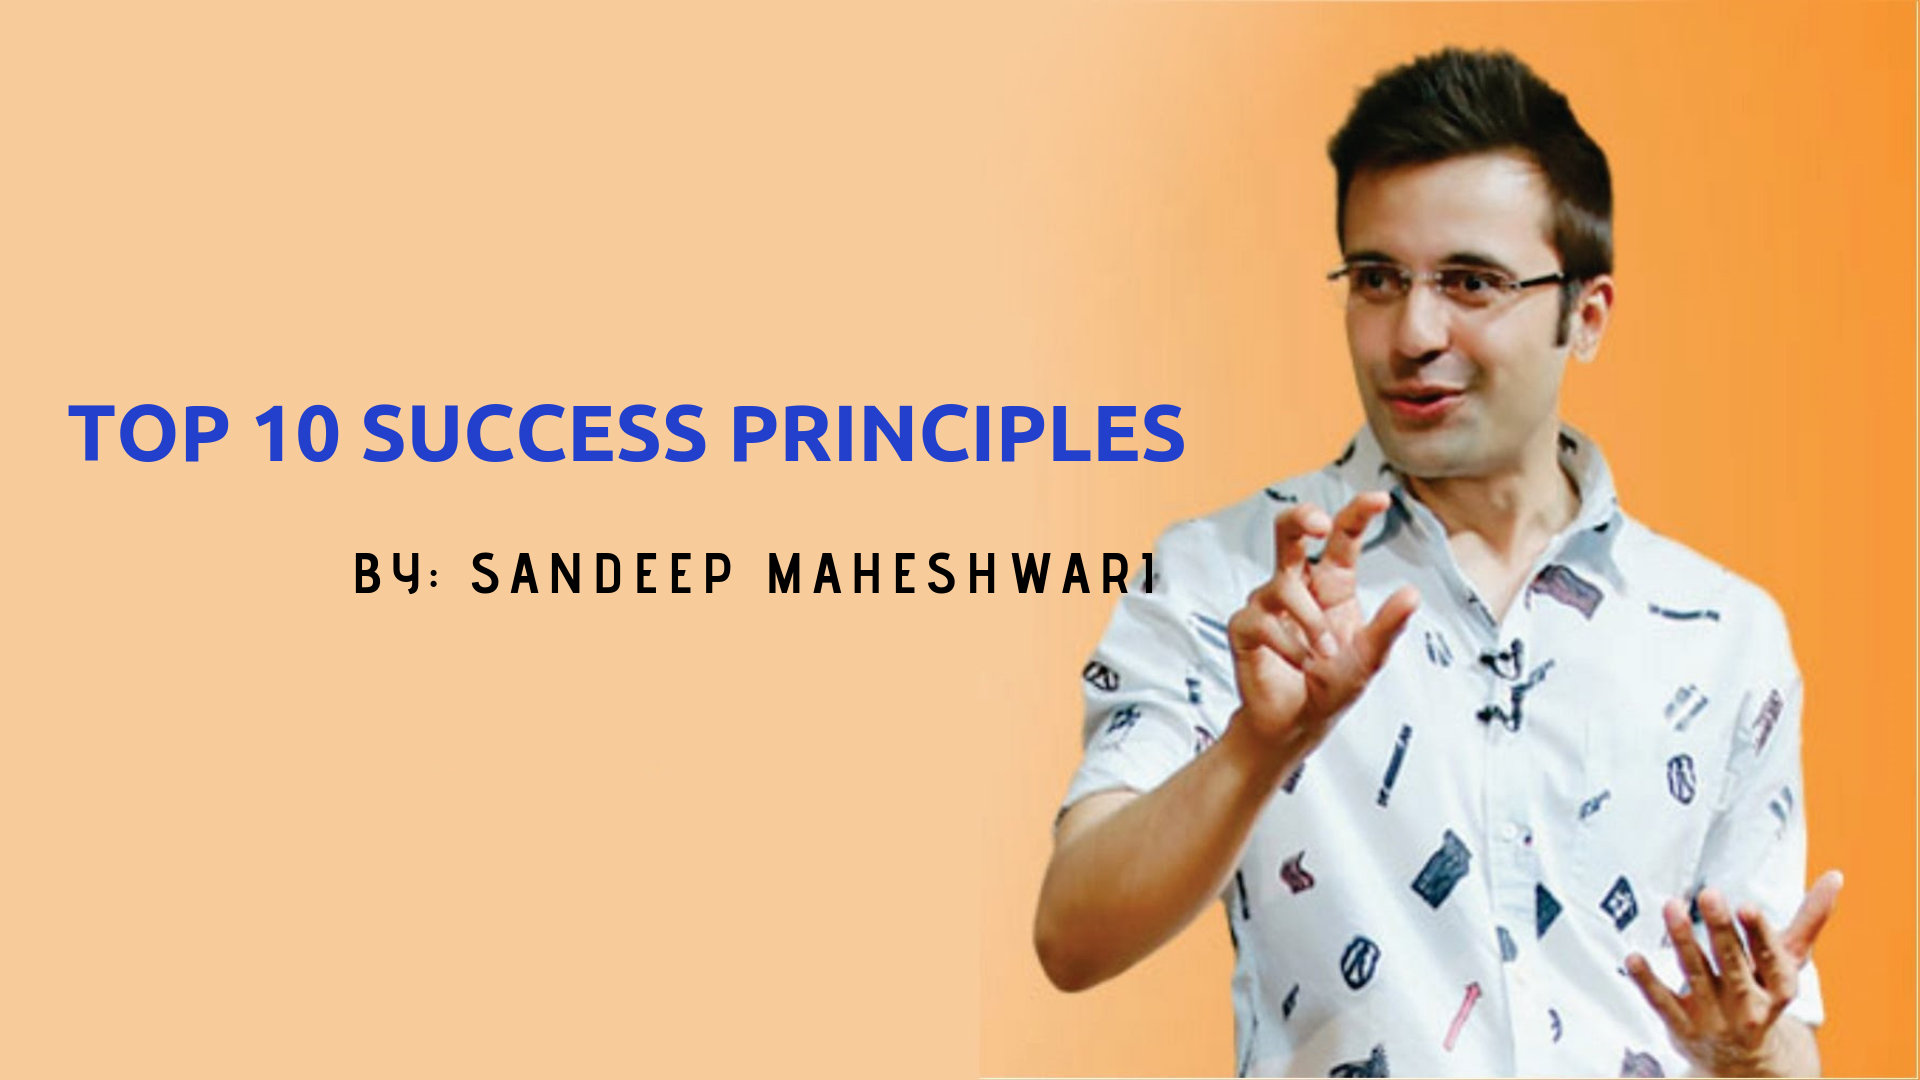 Top 10 Success Principles to Learn from Sandeep Maheshwari